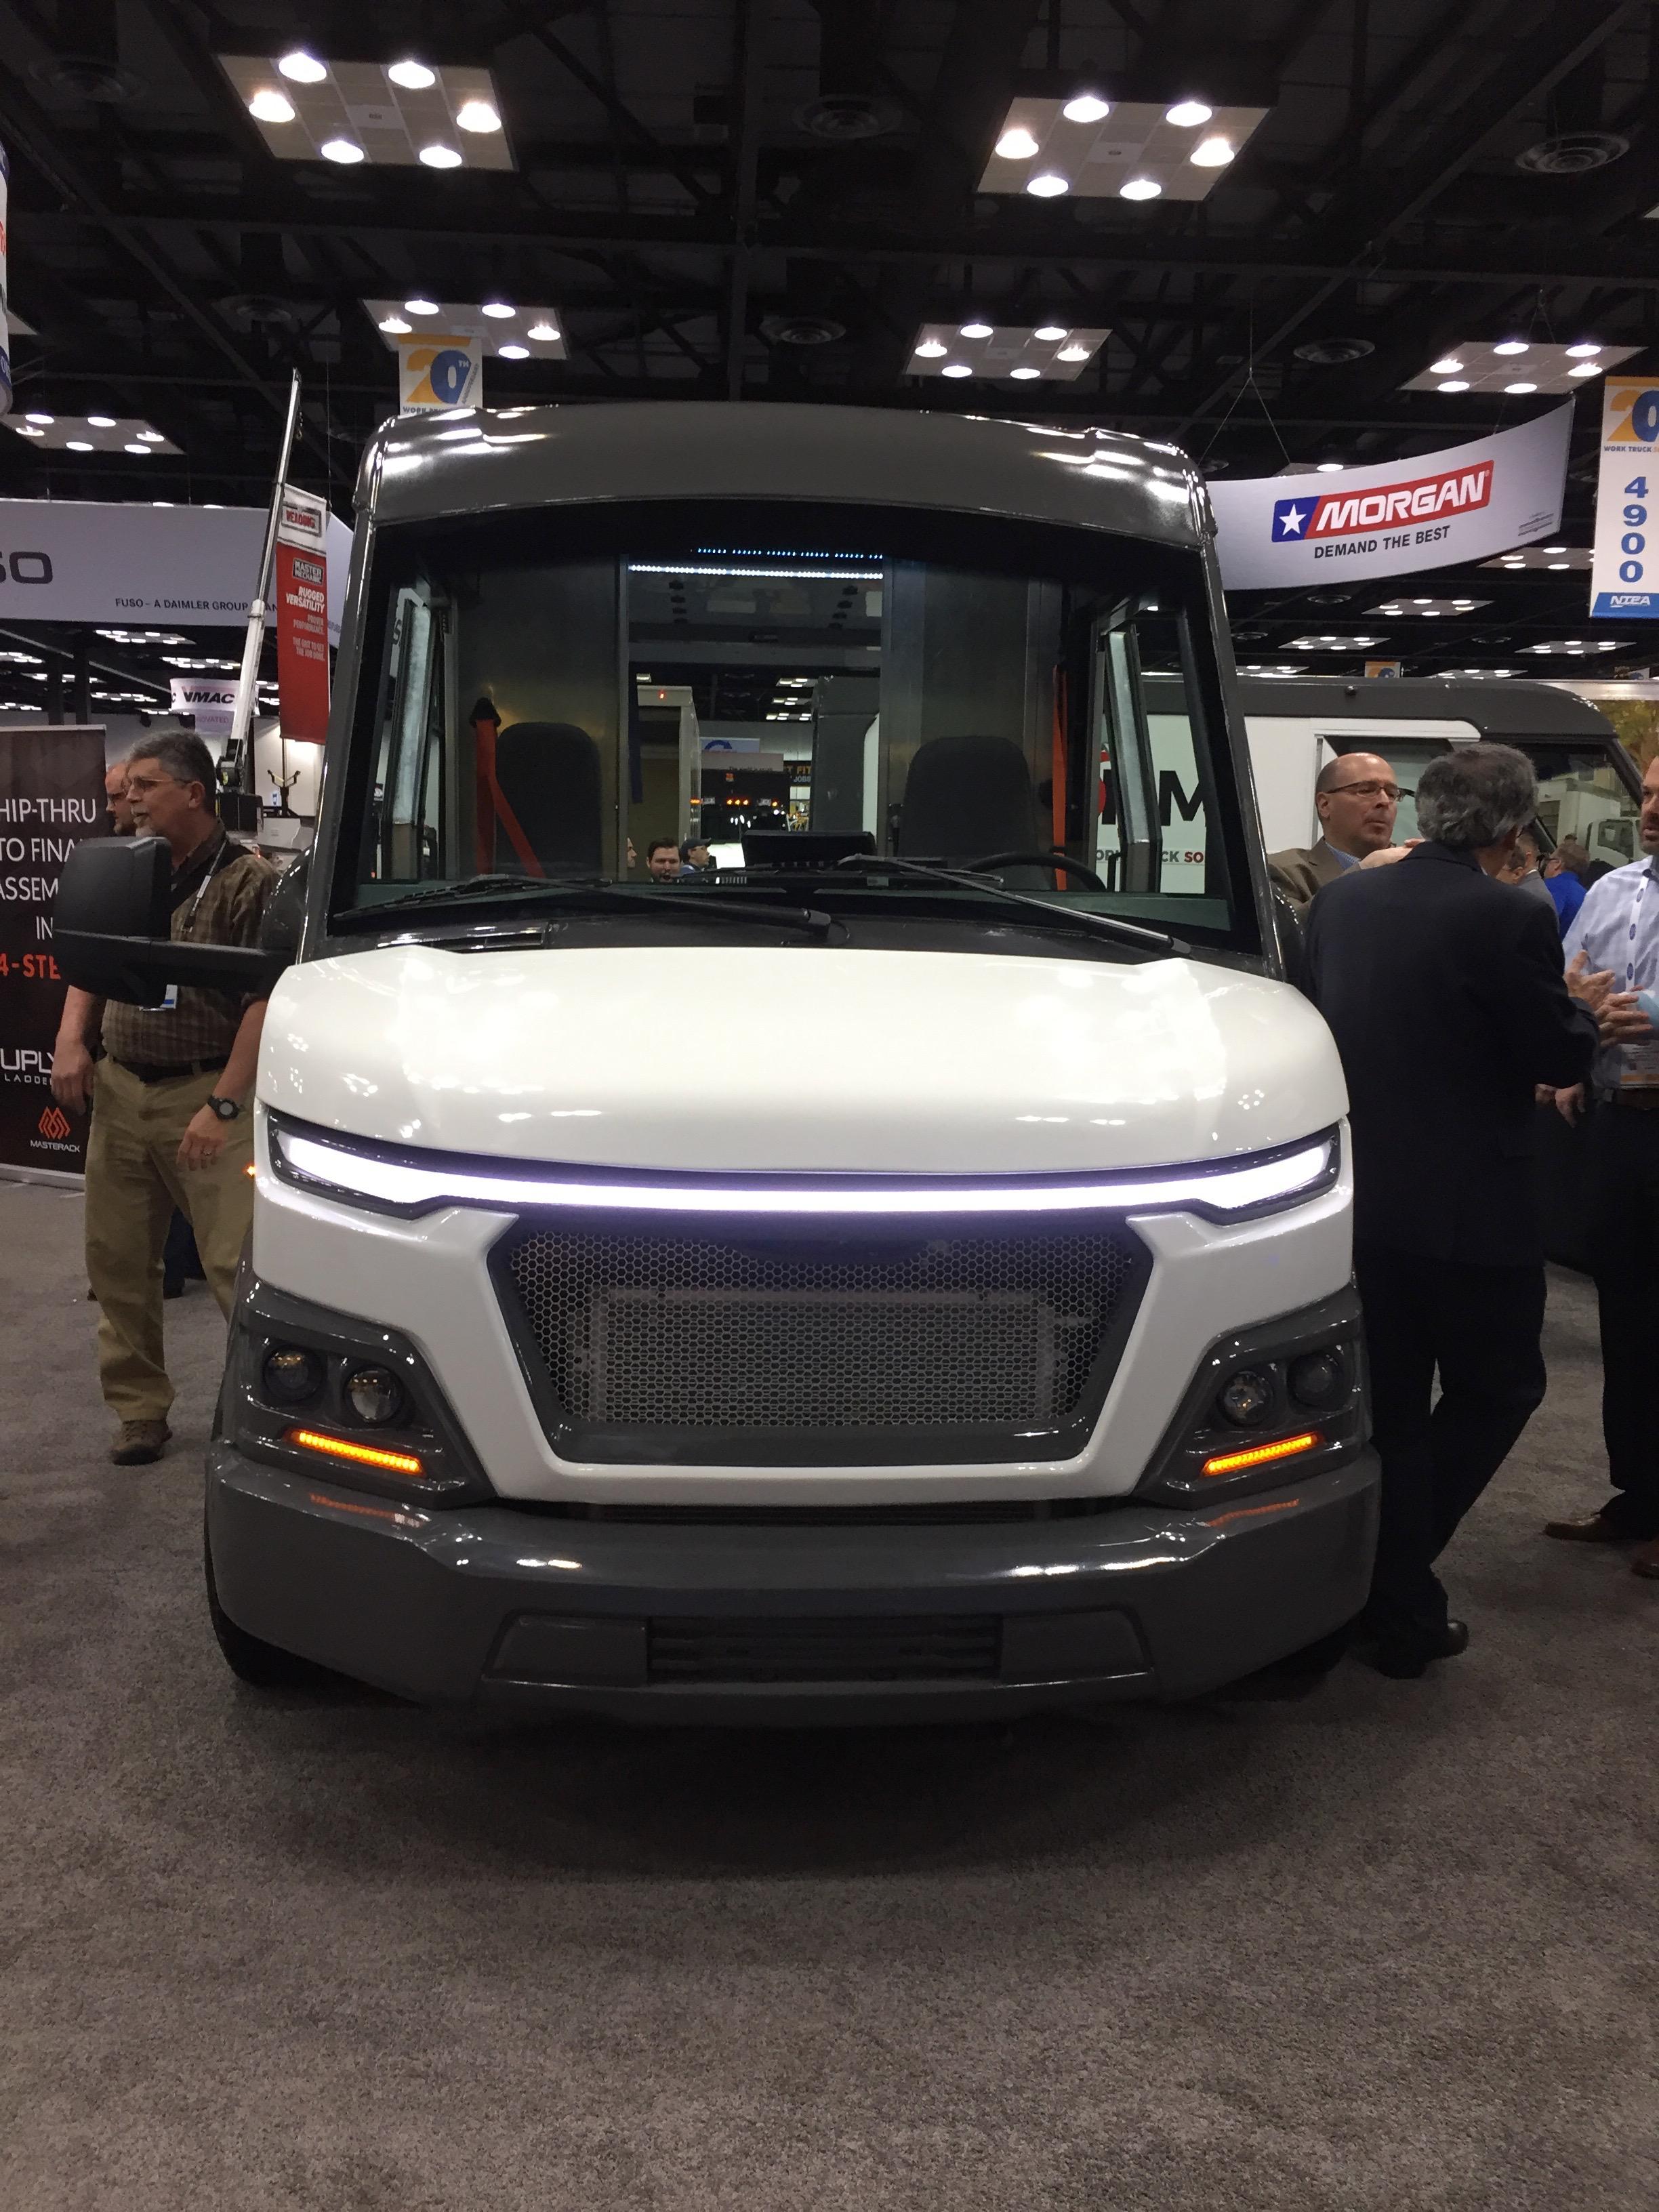 Morgan Olson all-electric van